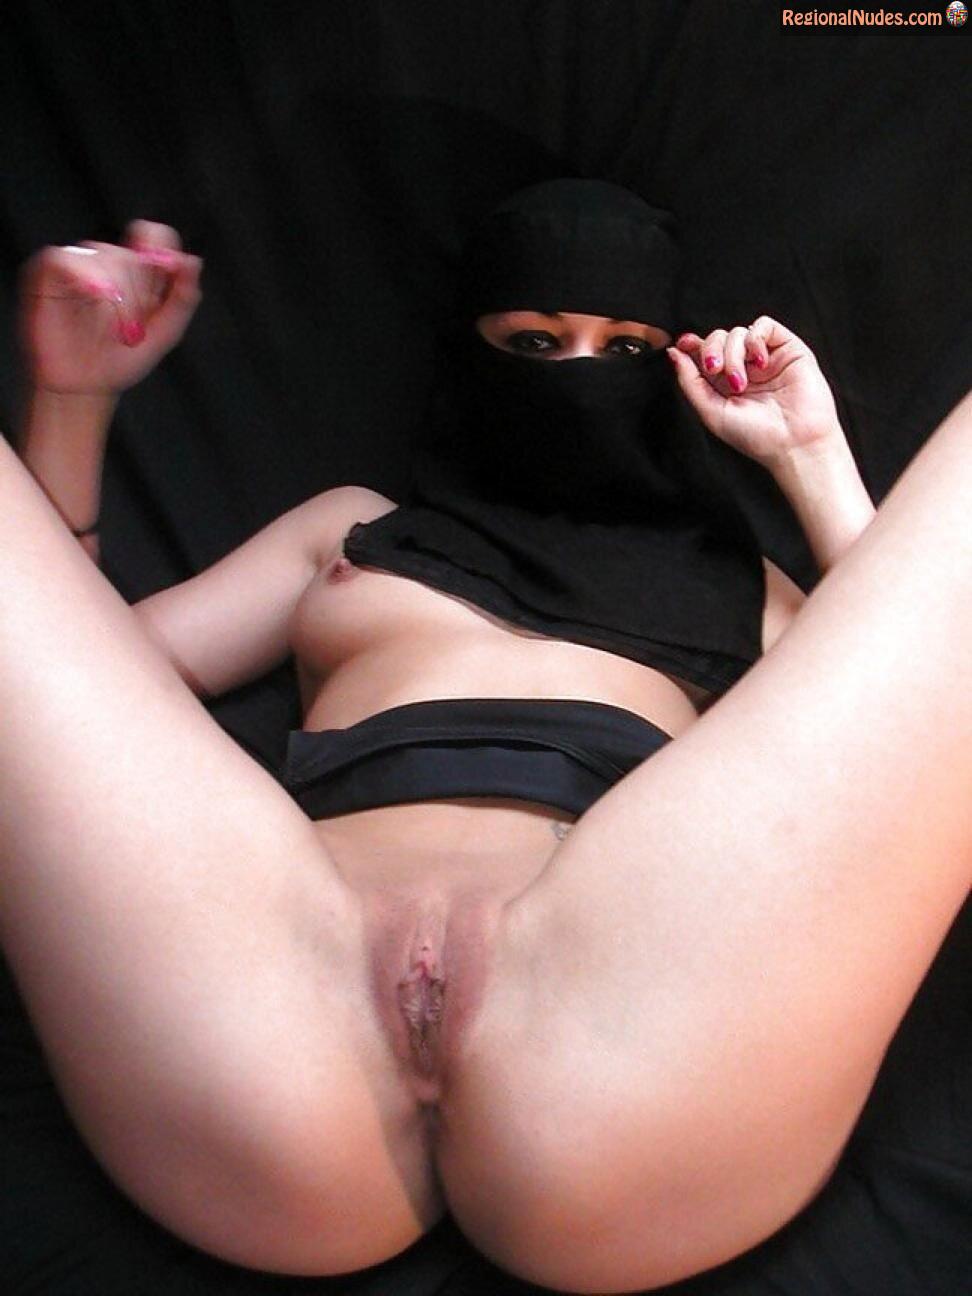 Elma postma nude picture